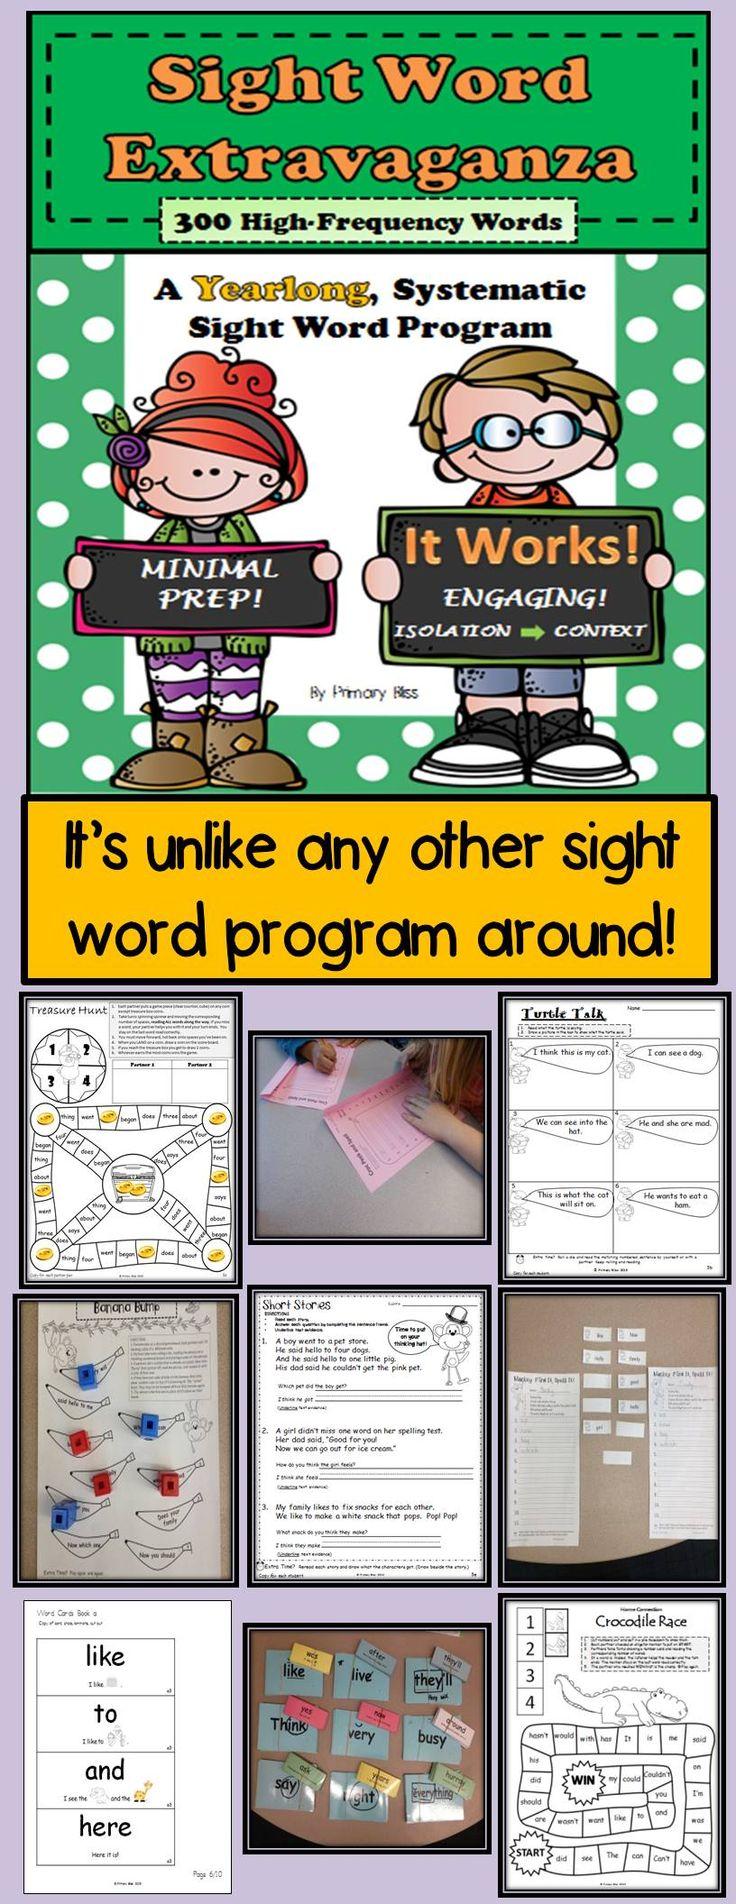 Worksheet Sight Word Program 17 best ideas about word program on pinterest kindergarten sight first grade high frequency words outstanding